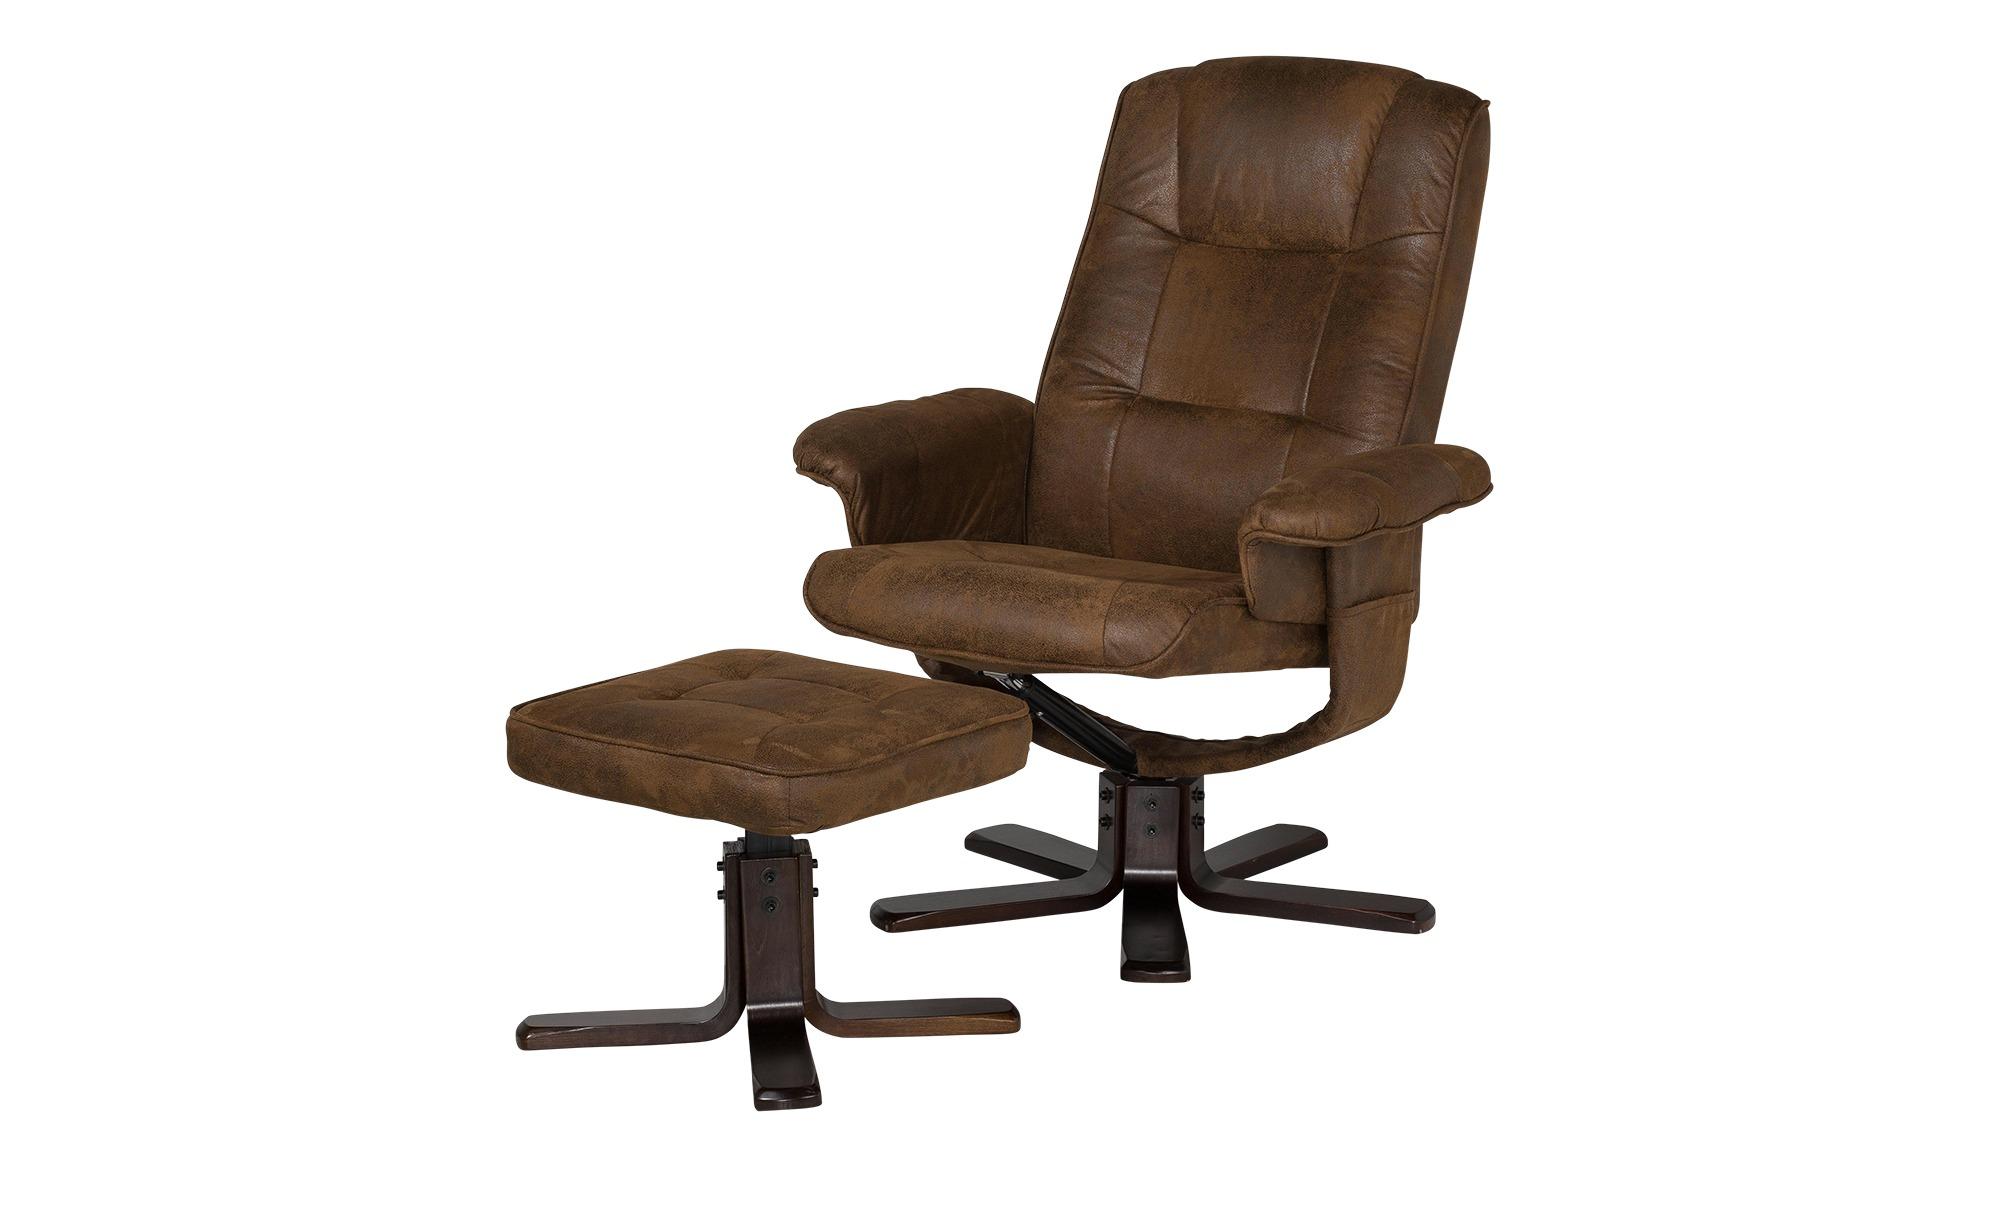 Sessel mit Hocker braun - Stoff Alyssa ¦ braun Polstermöbel > Sessel > Polstersessel - Höffner